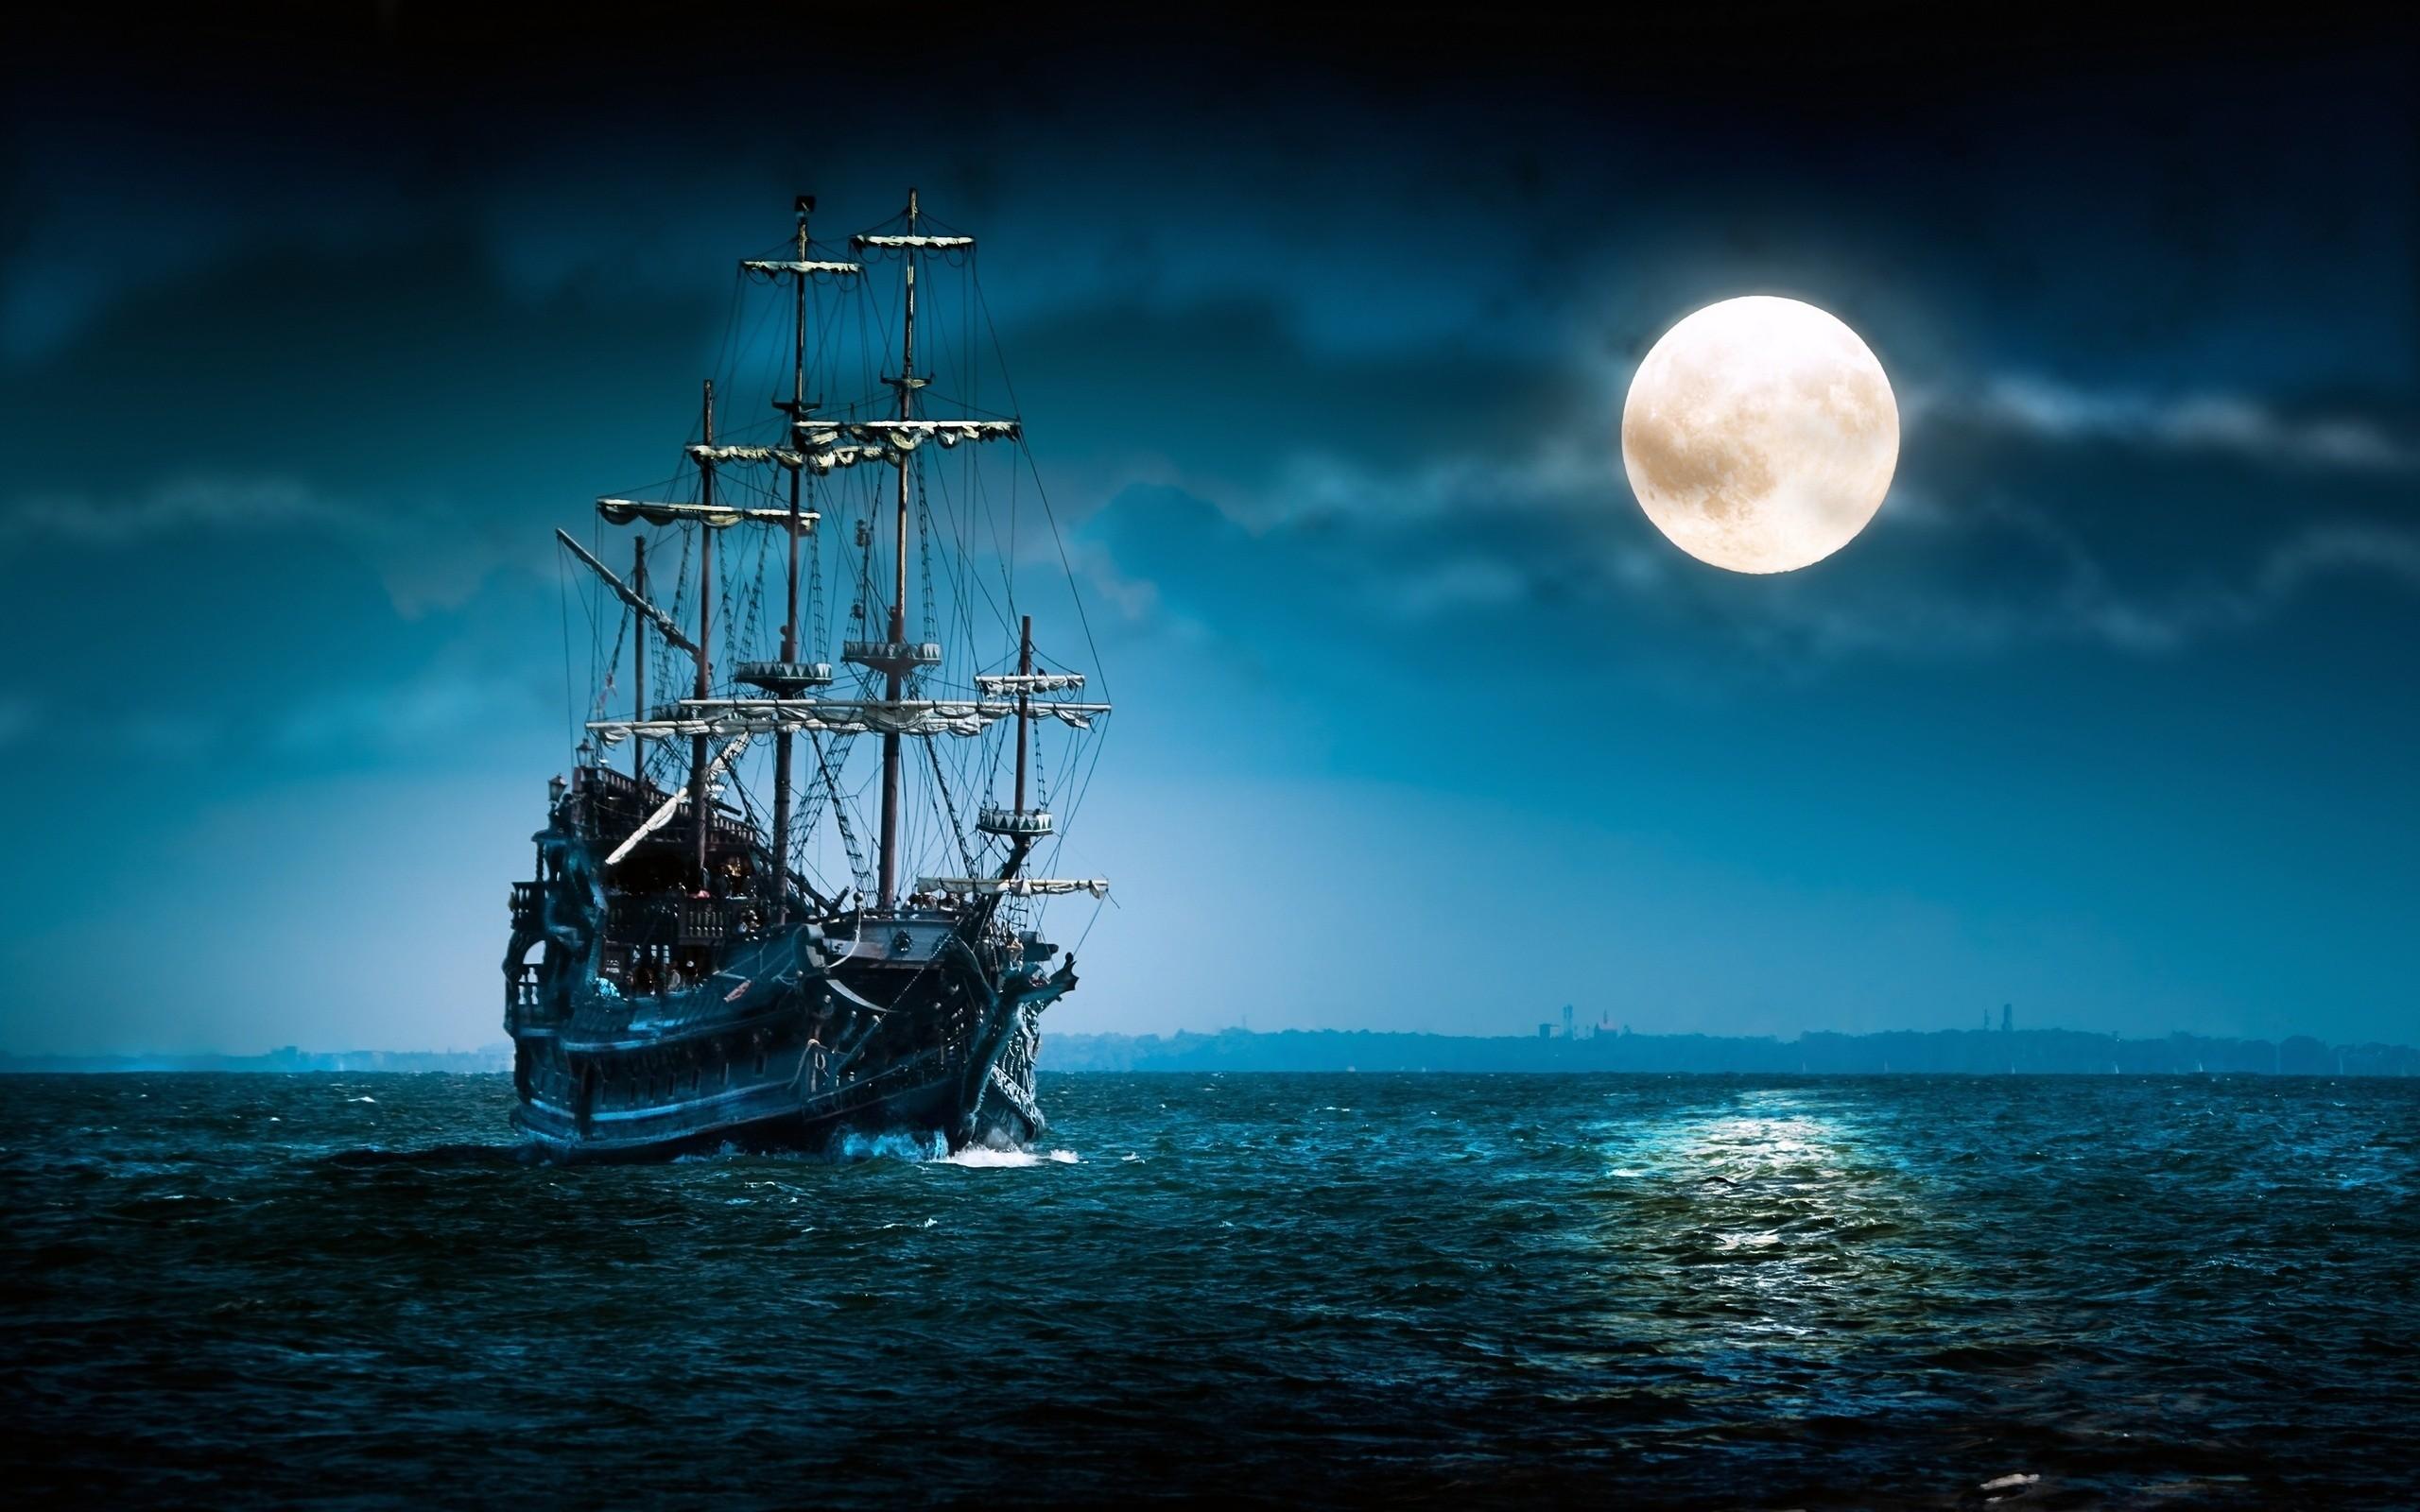 sailboat sea moon ship boat ocean night mood moon wallpaper background